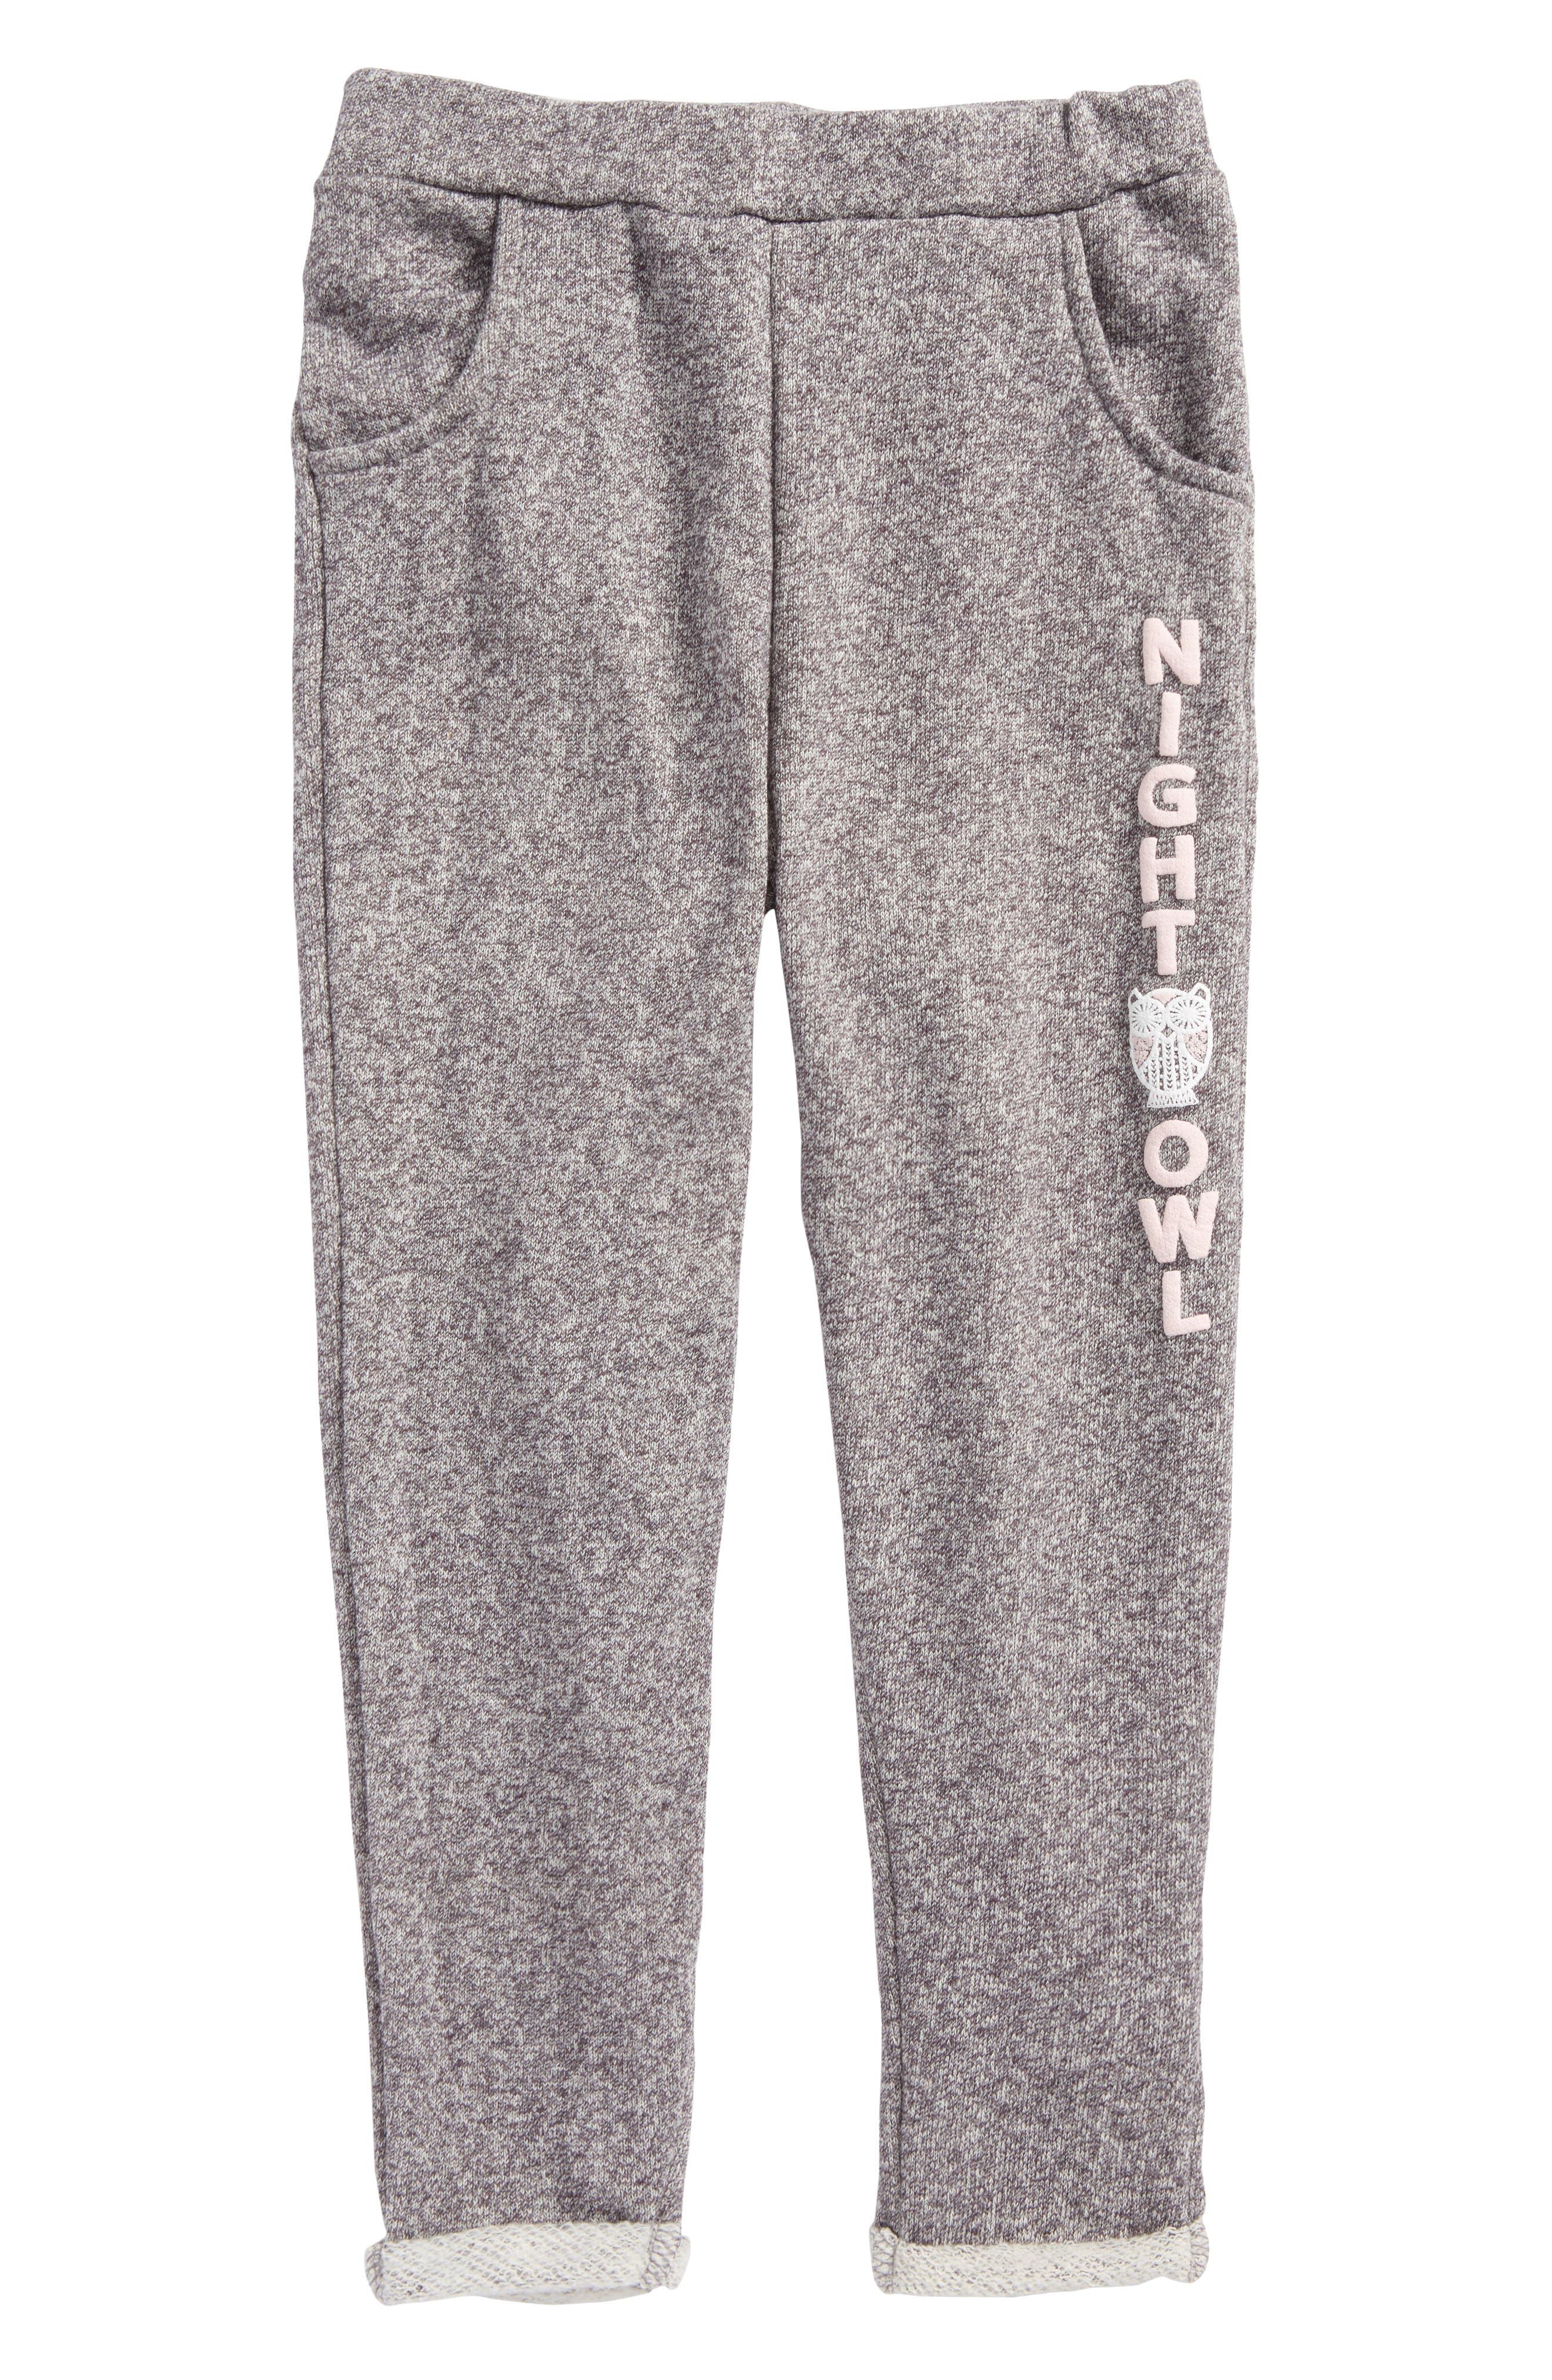 Alternate Image 1 Selected - O'Neill Frosty Fleece Night Owl Pants (Toddler Girls & Little Girls)